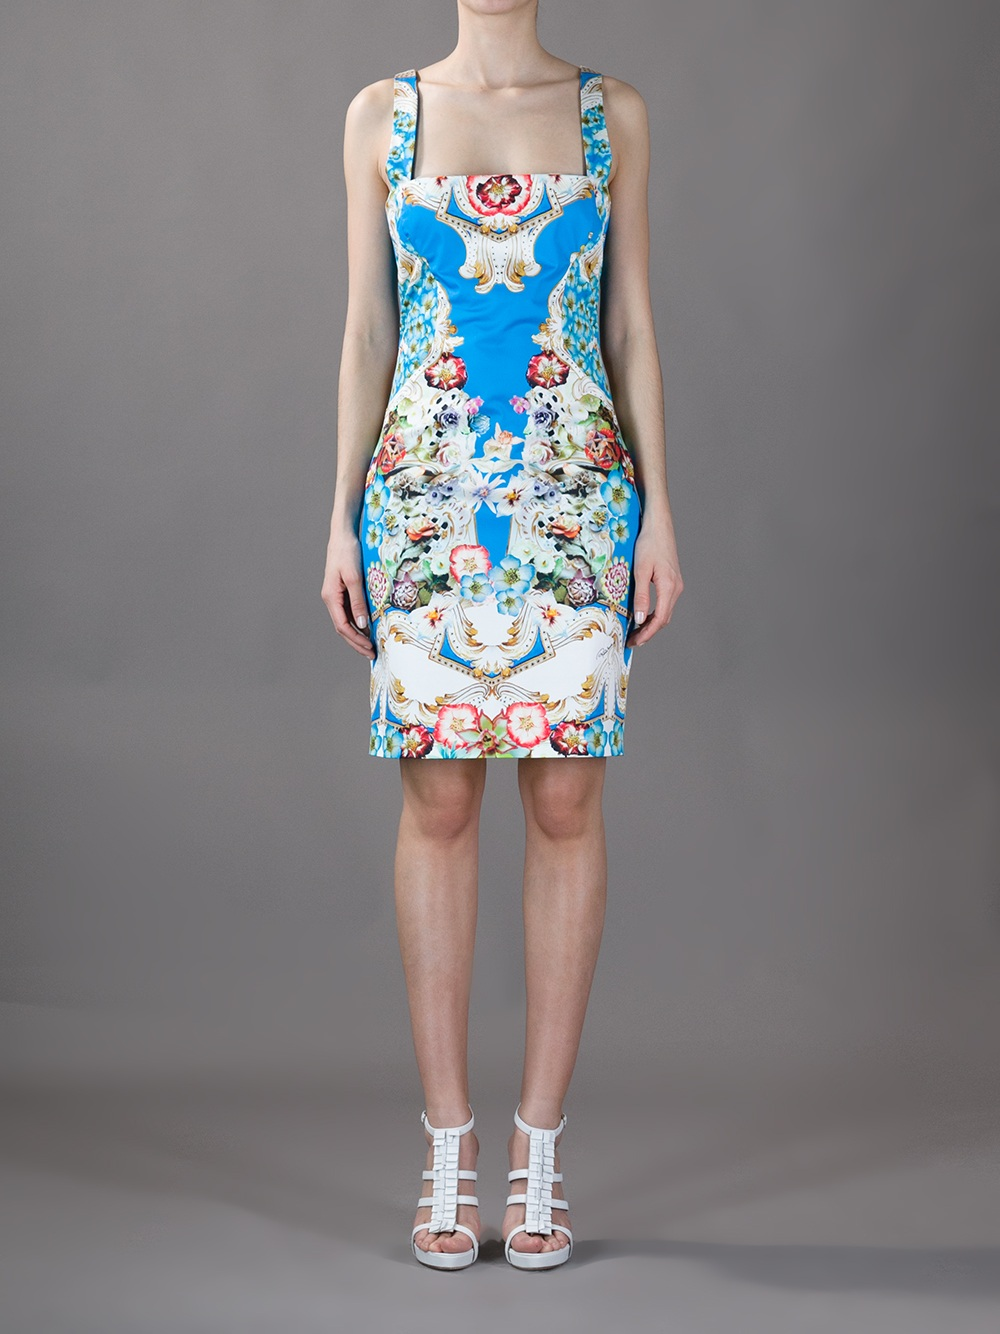 Roberto Cavalli Sleeveless Floral Print Dress In Blue Lyst